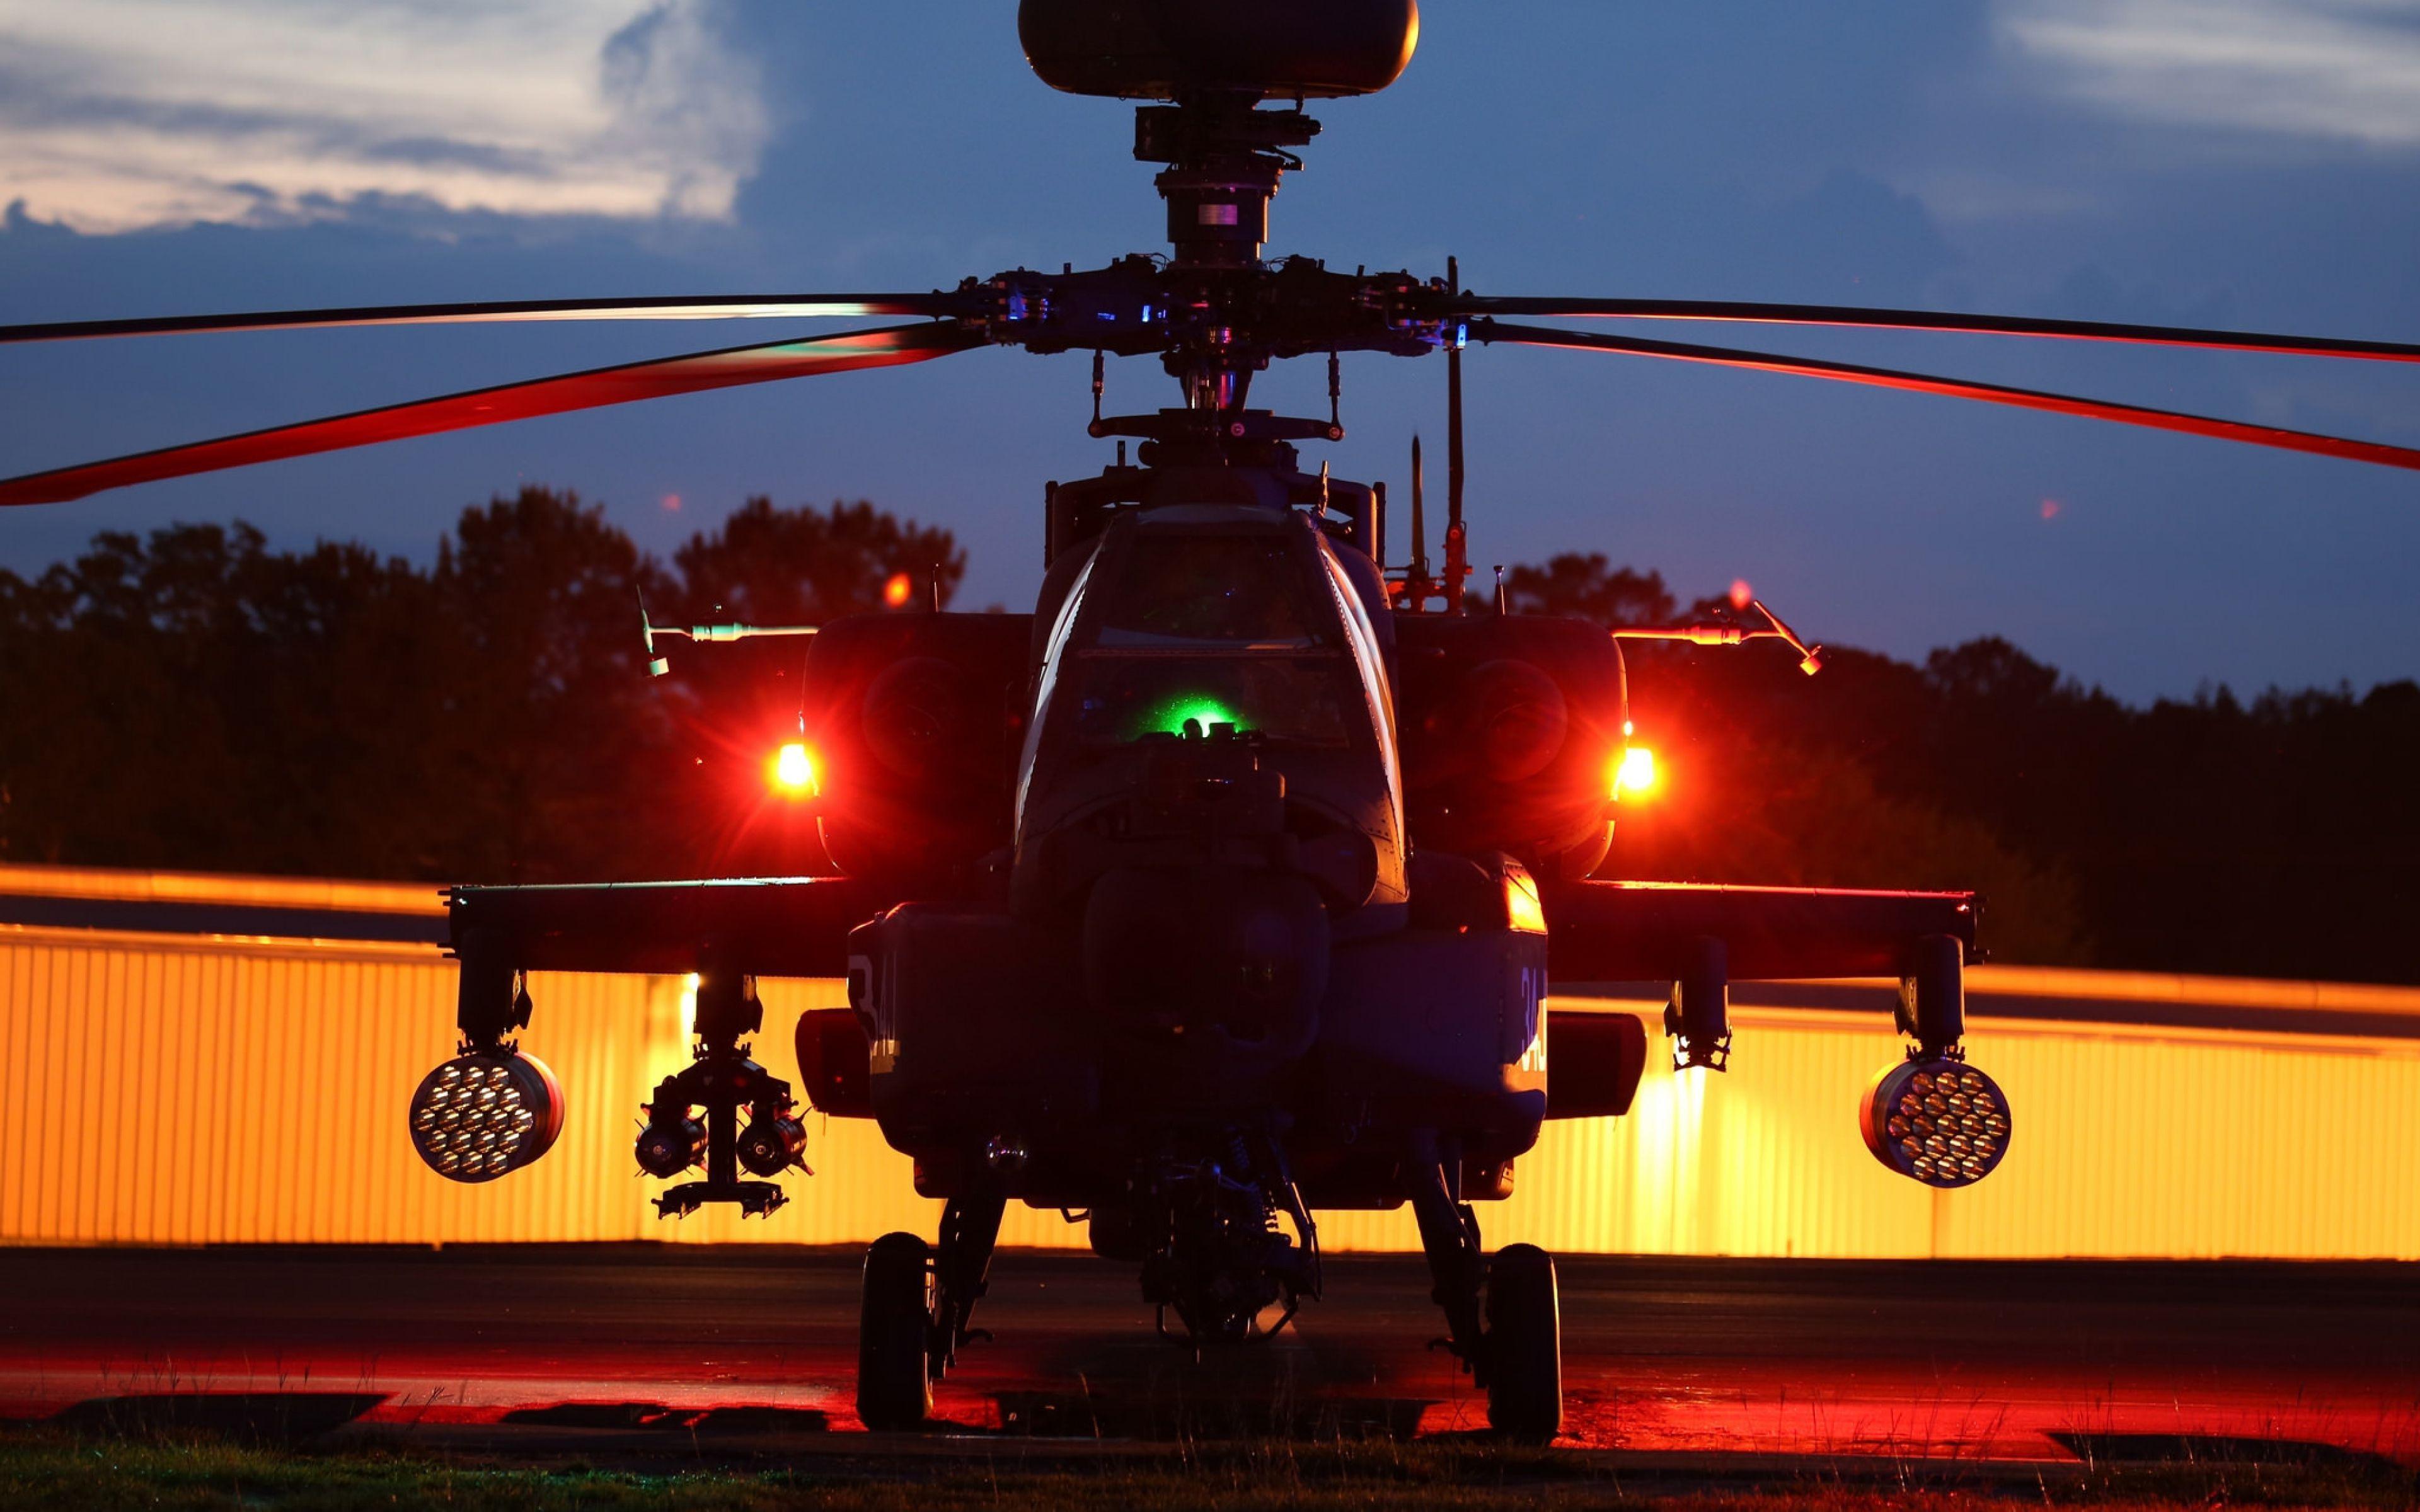 Military Helicopter 4k Hd Desktop Wallpaper For 4k Ultra: Boeing AH-64 Apache Wallpapers